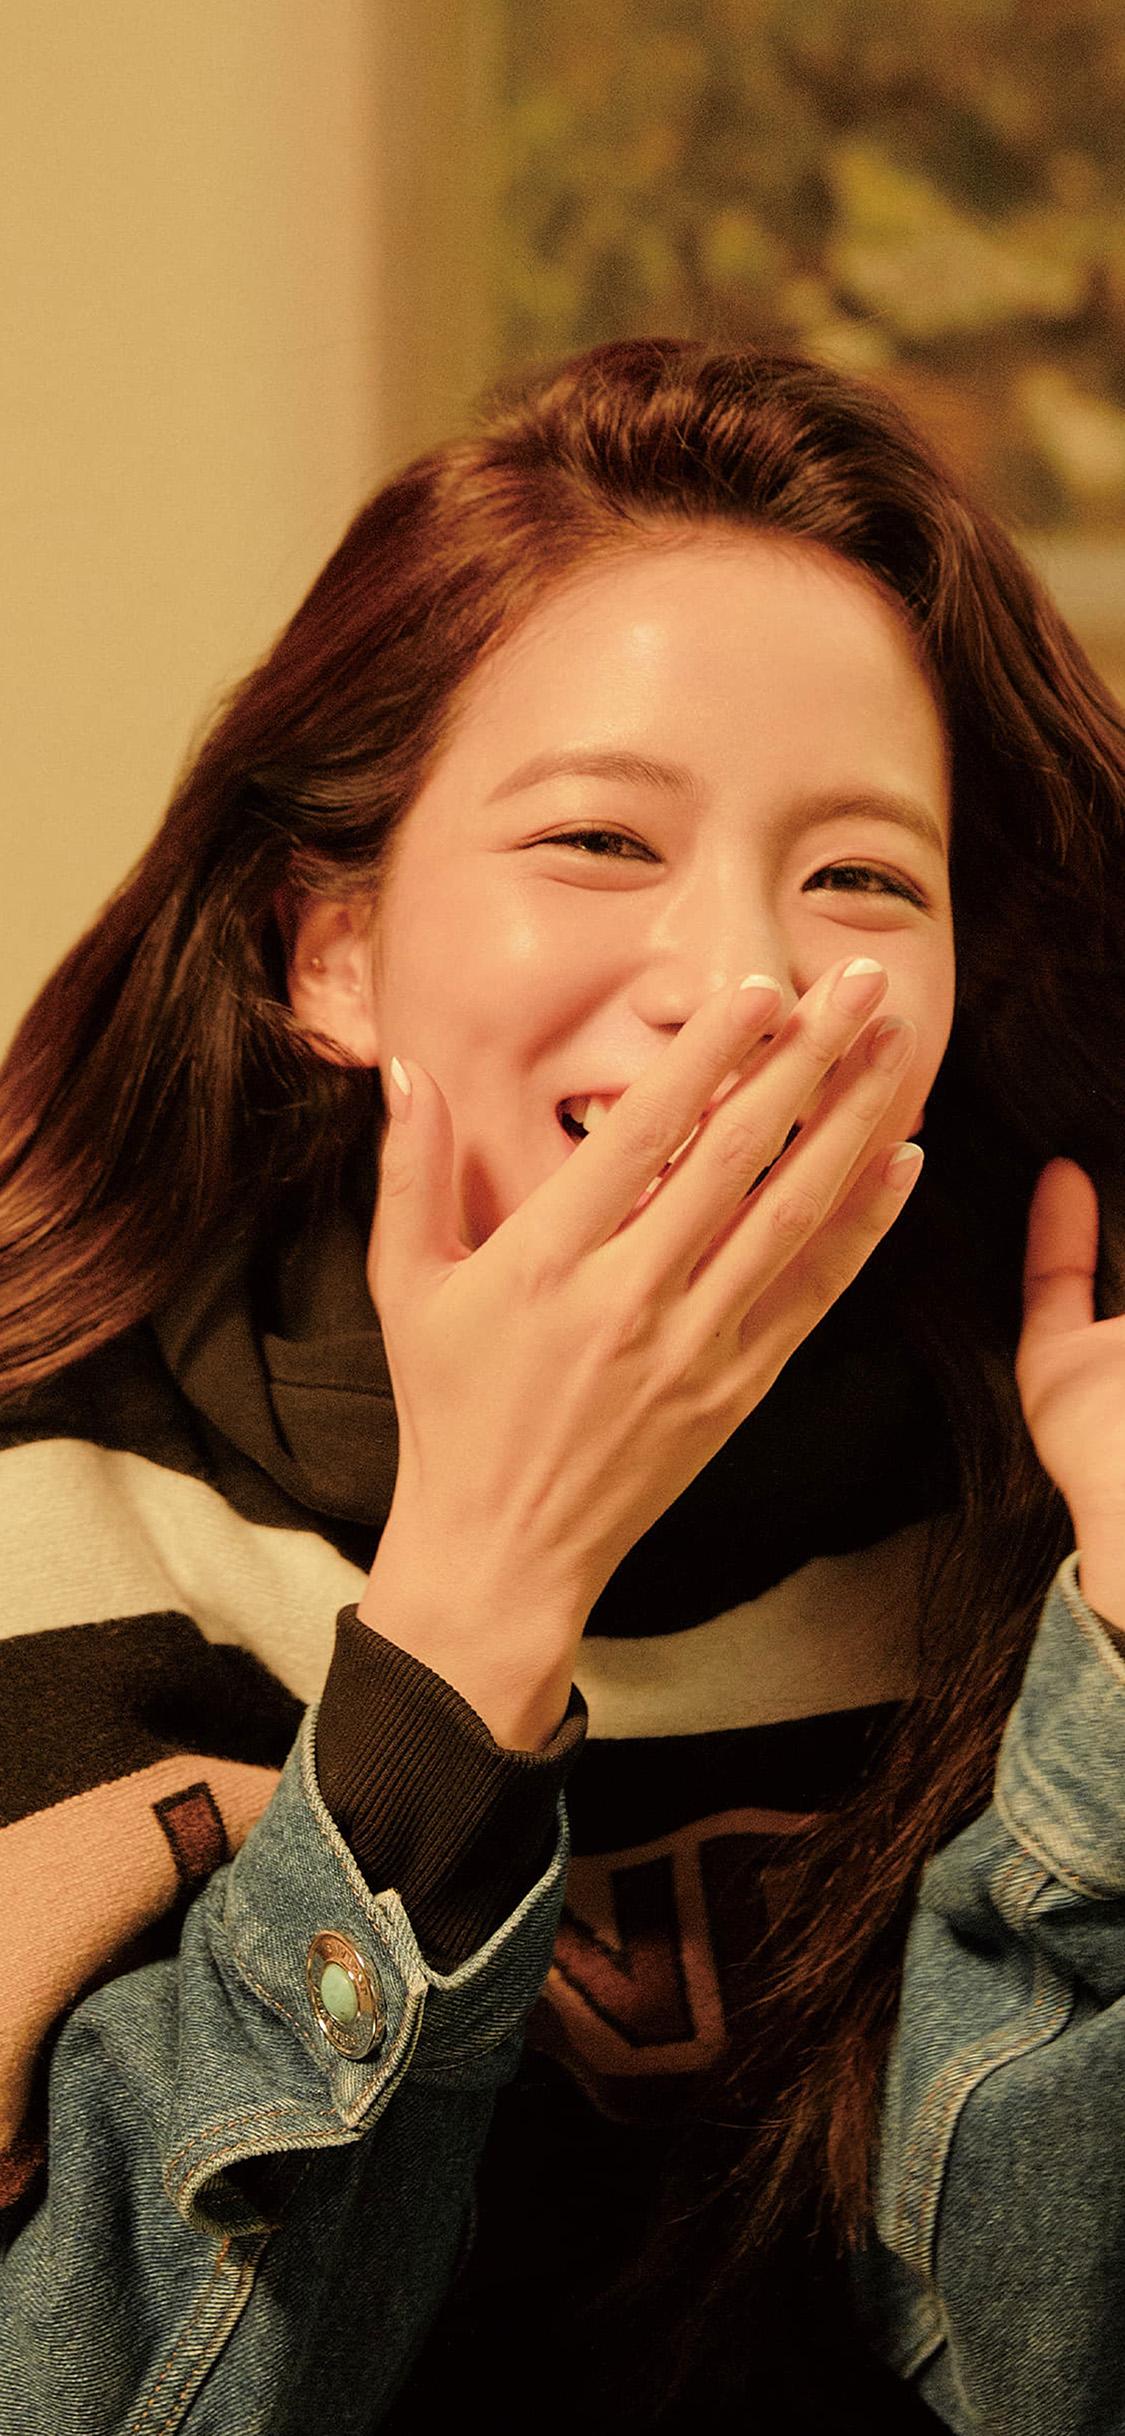 iPhonexpapers.com-Apple-iPhone-wallpaper-ht04-smile-kpop-girl-beauty